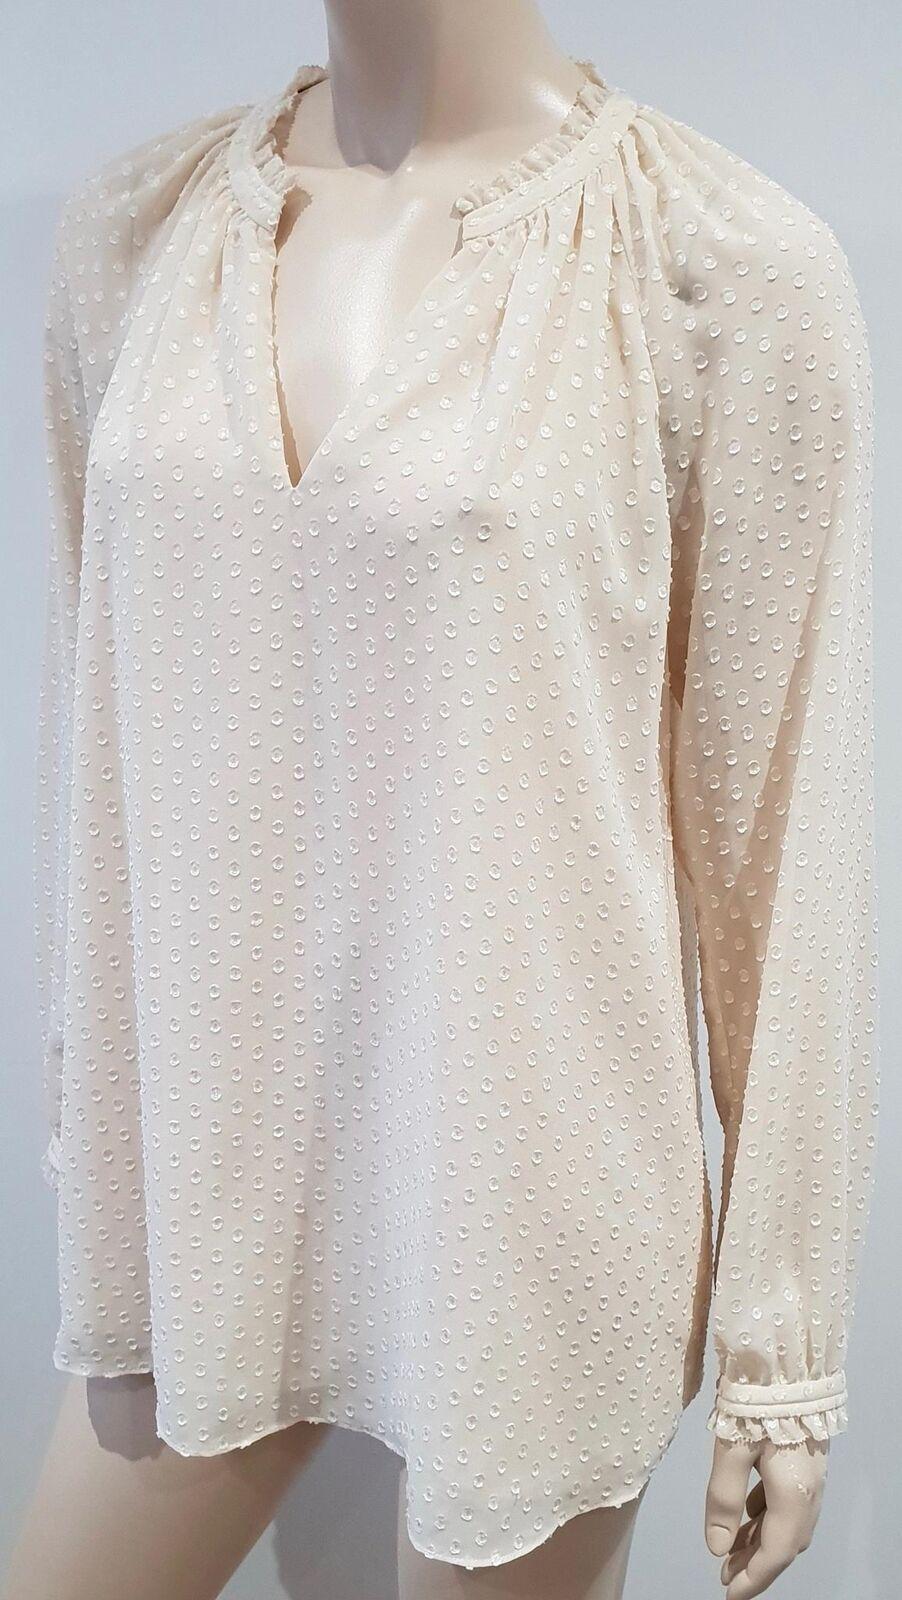 DIANE VON FURSTENBURG Cream Beige Polka Dot Long Sleeve Tunic Blouse Top 8 UK12